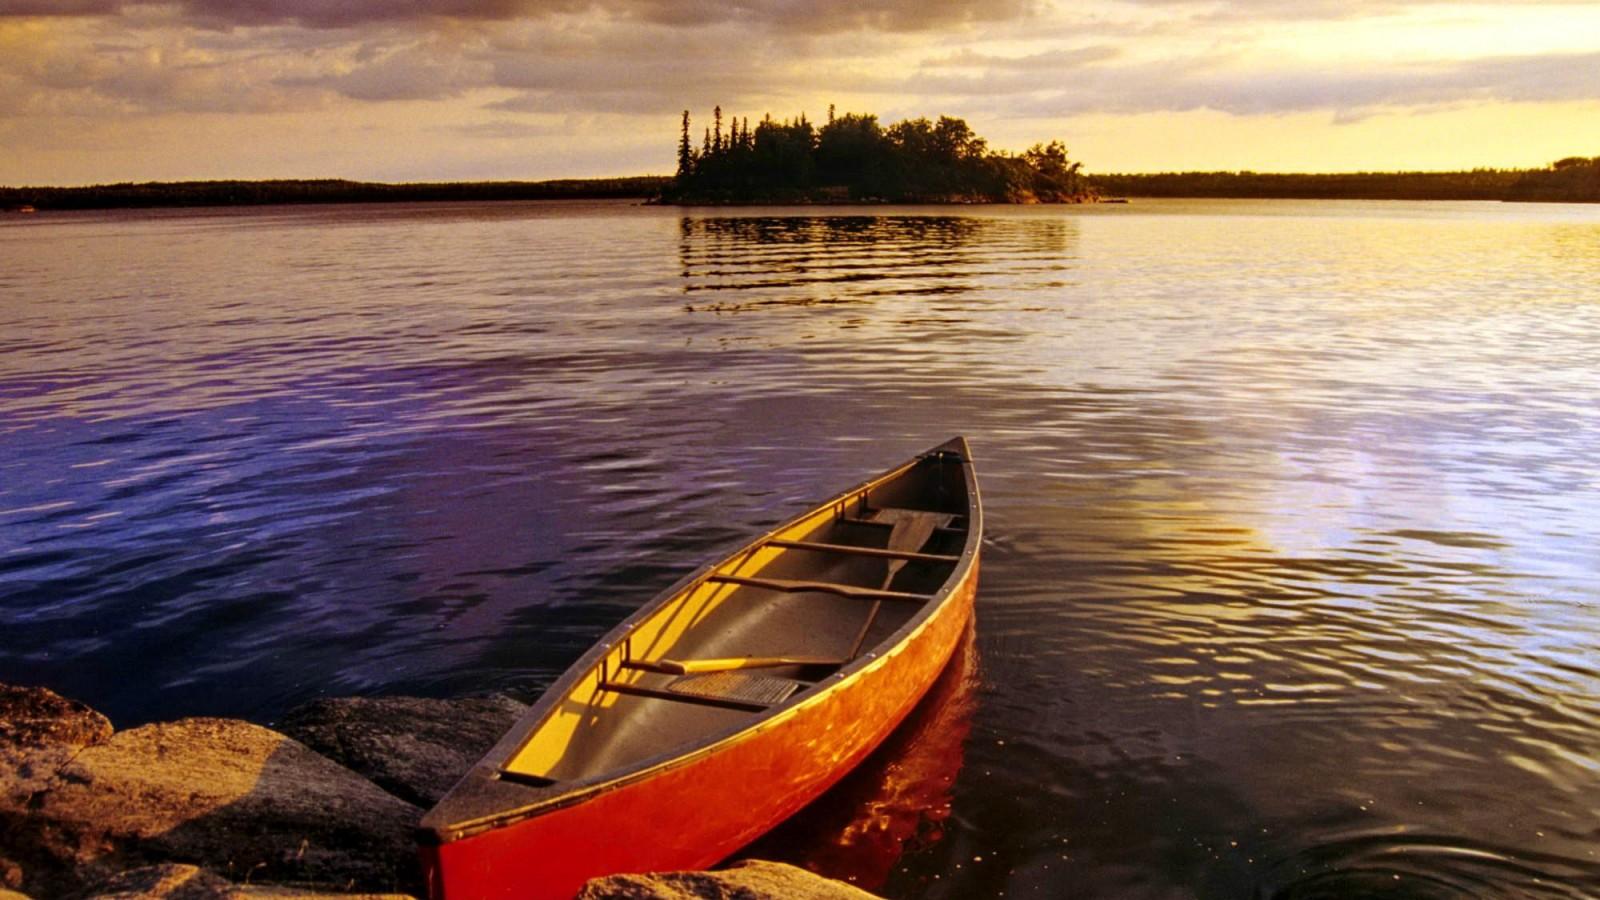 93 Canoe Wallpapers On Wallpapersafari